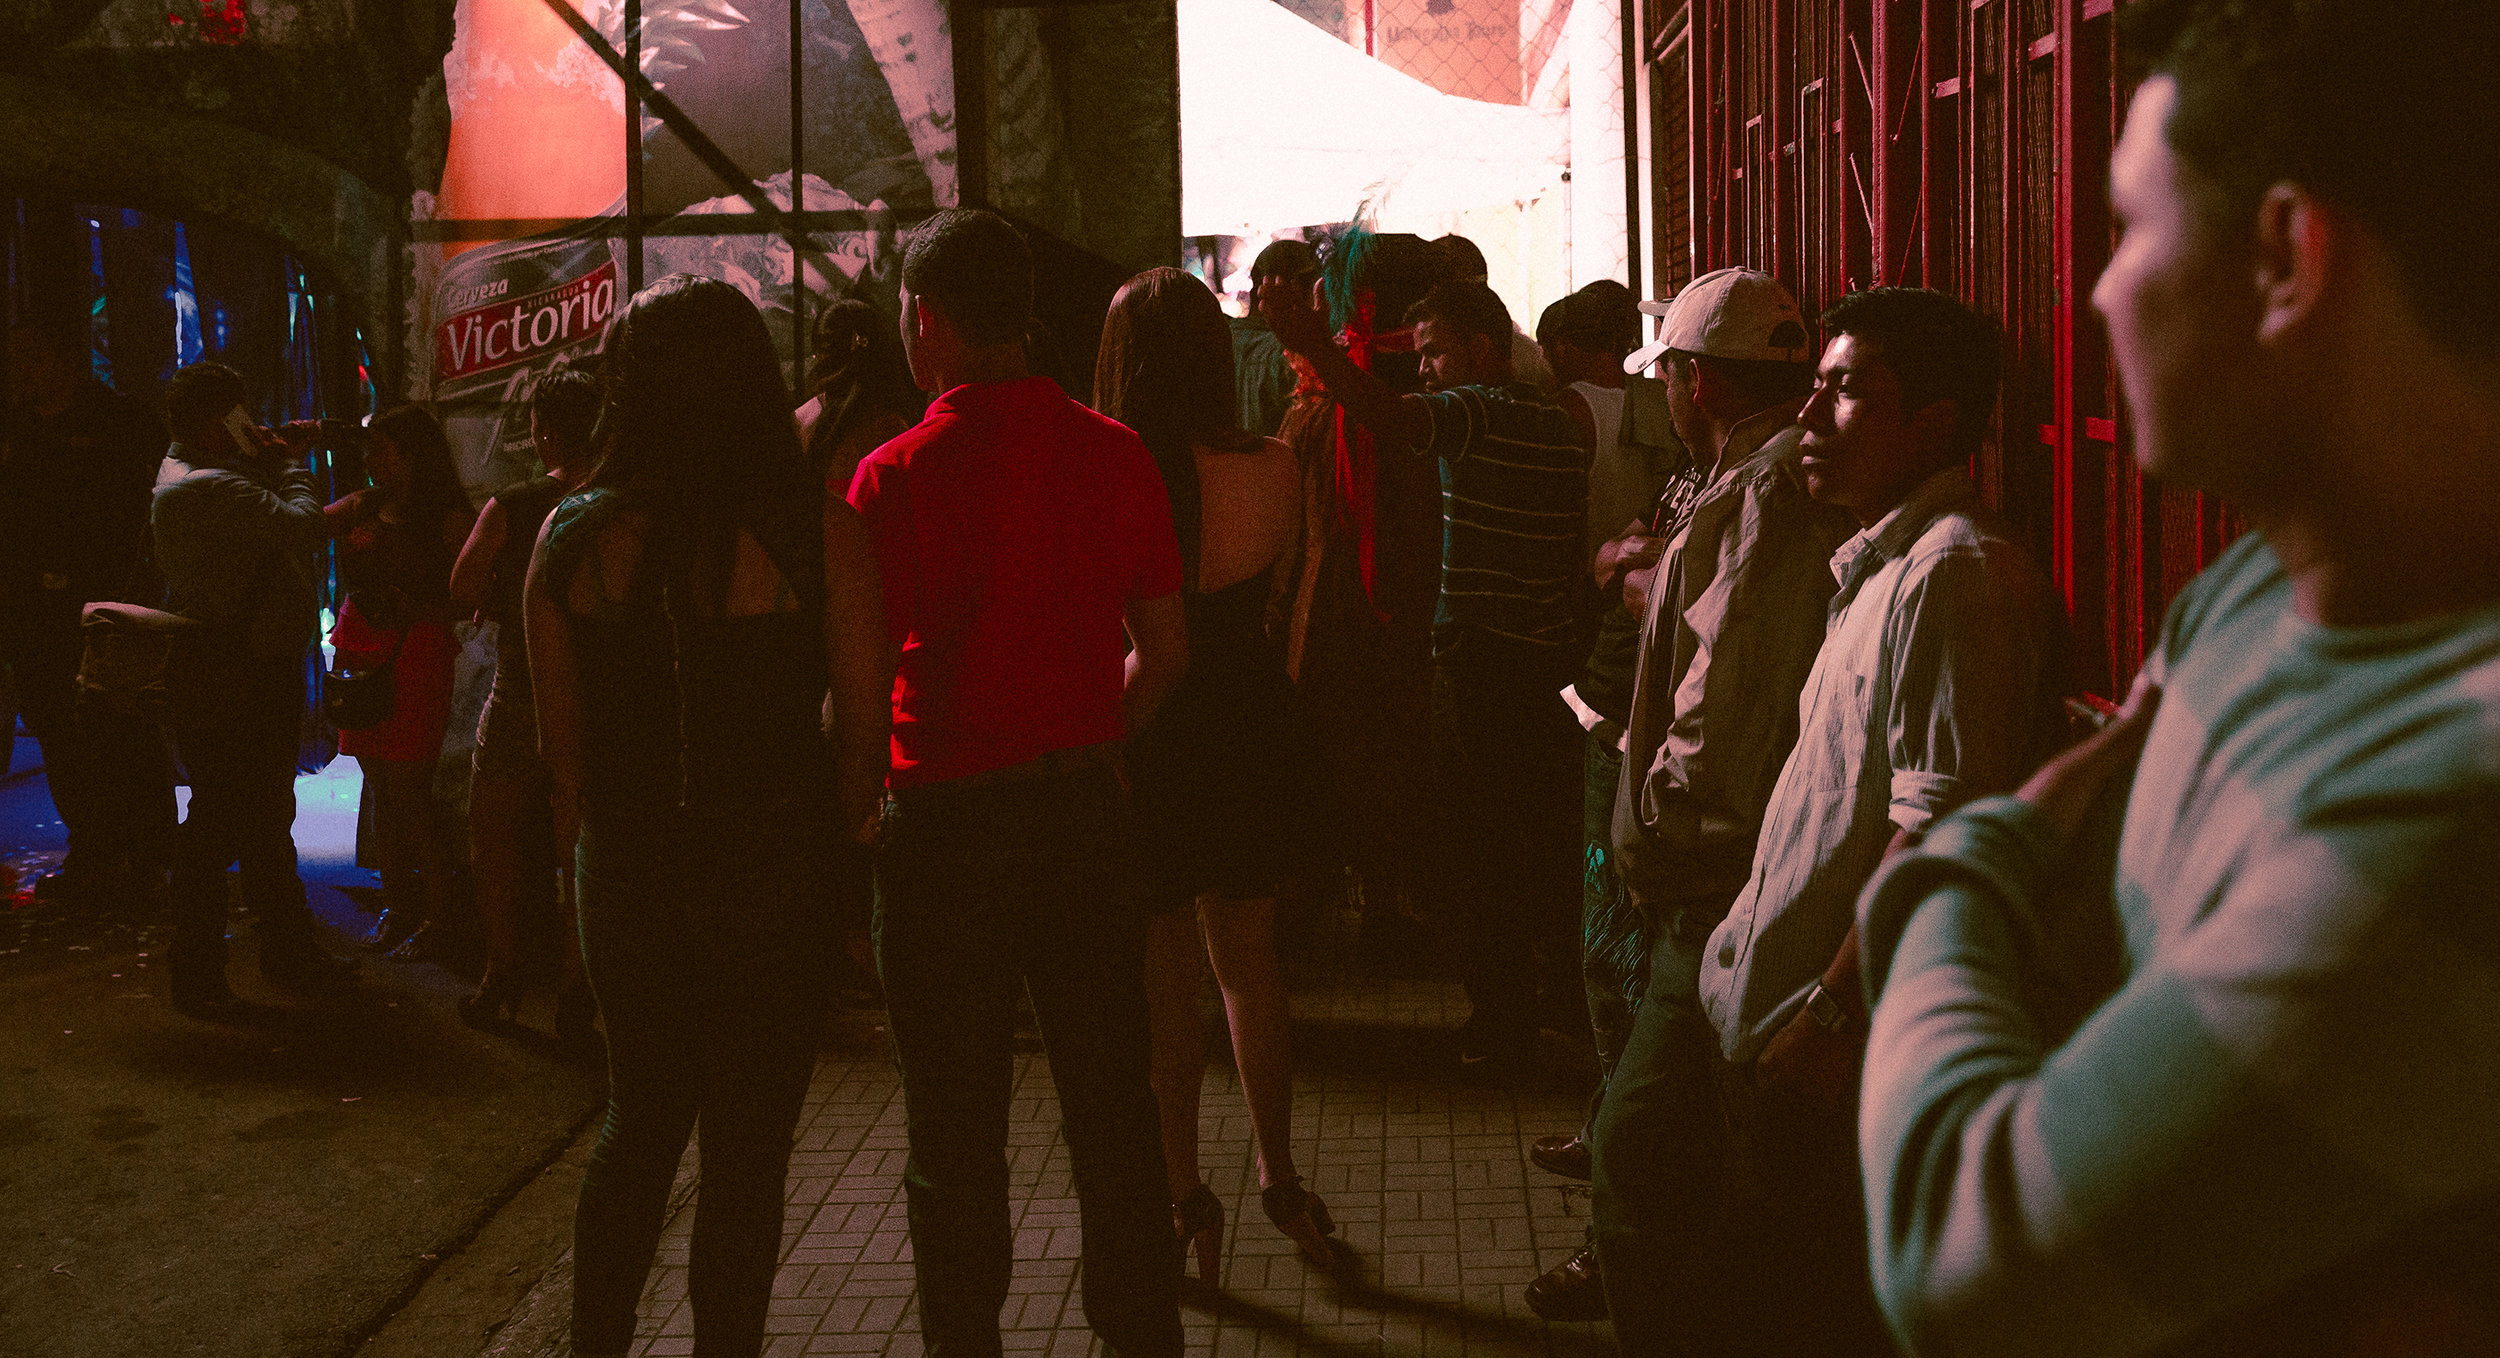 jonathanburkhart,oklahoma,streetphotography,matagalpa,nicaragua_13.jpg